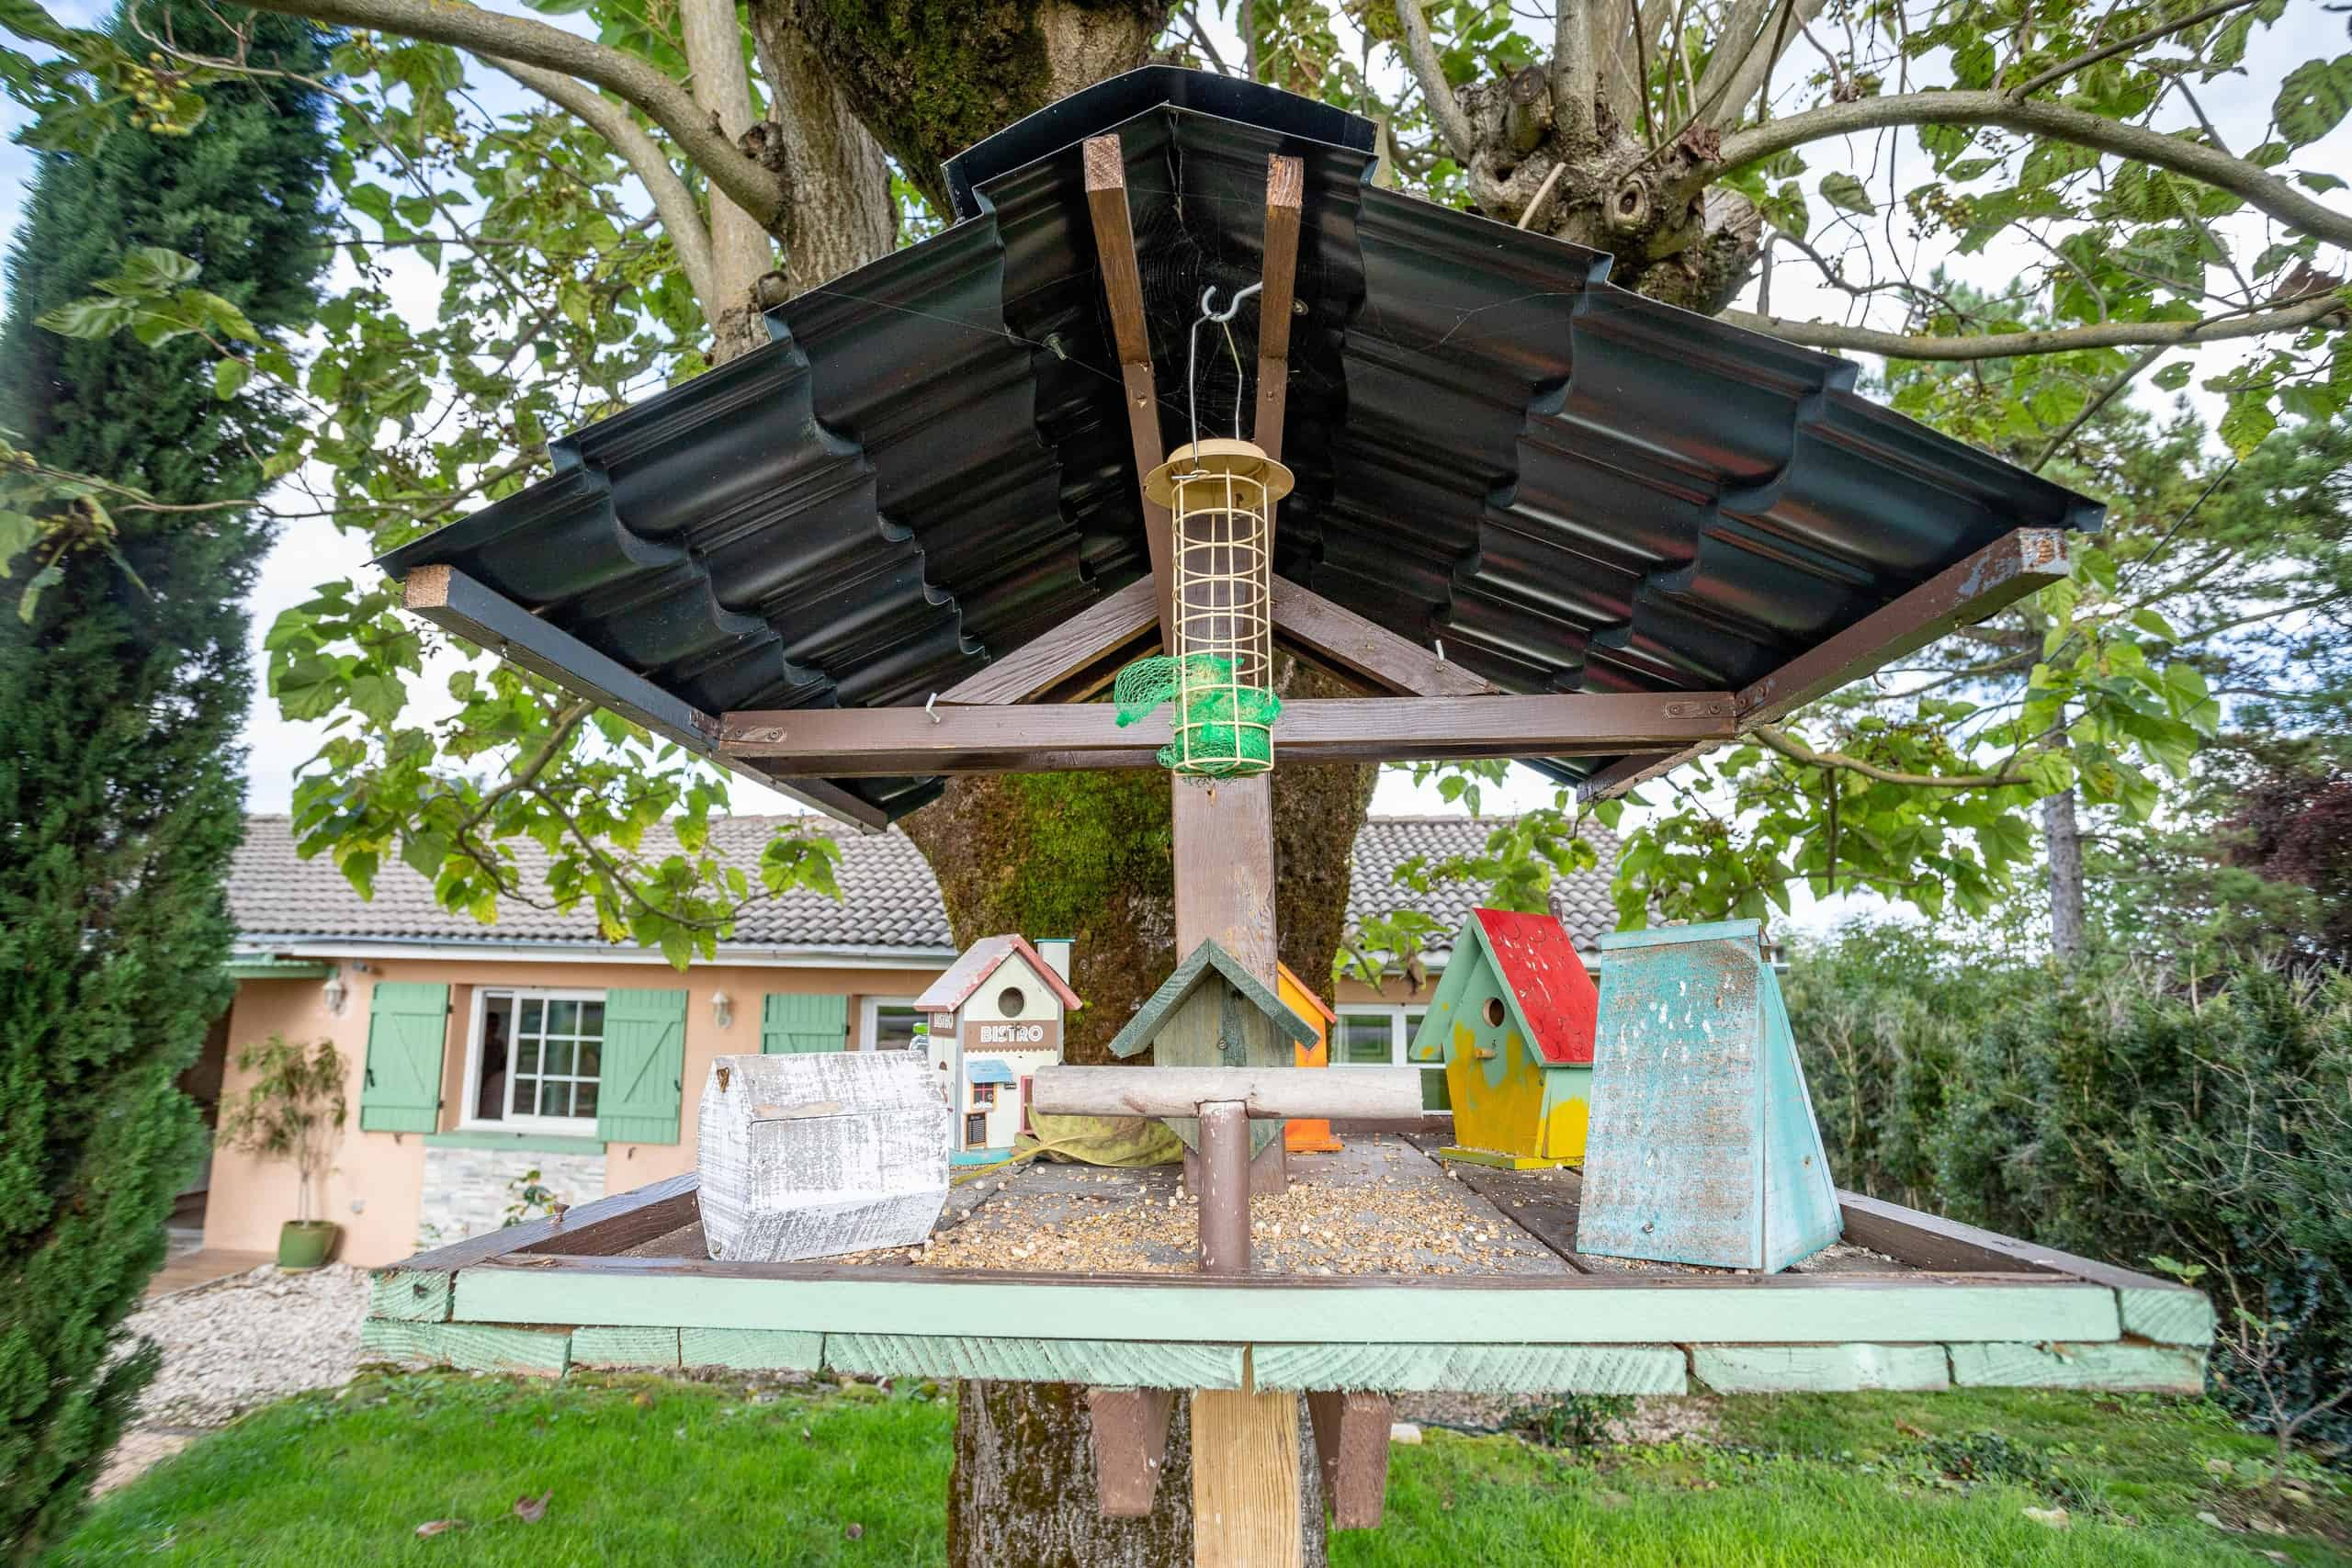 Maison d'oiseau-WMC109